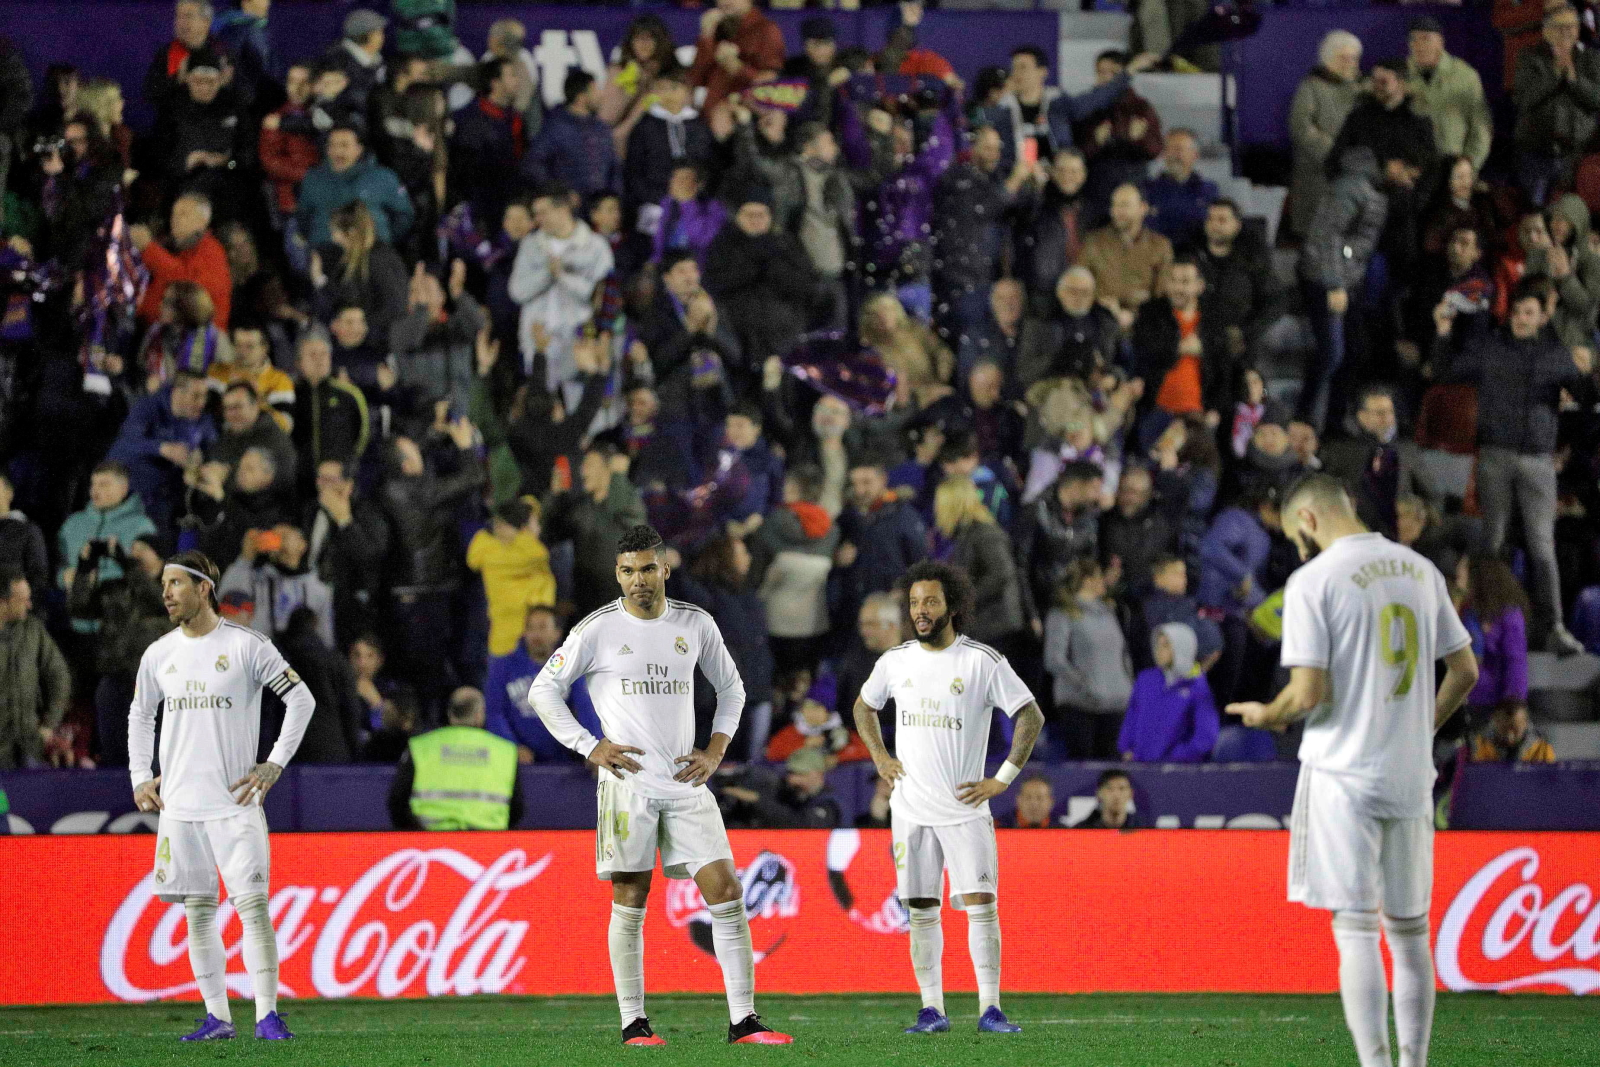 La Liga. Levante - Real Madryt: sensacja! Porażka Królewskich. Barcelona liderem! - Sport WP SportoweFakty